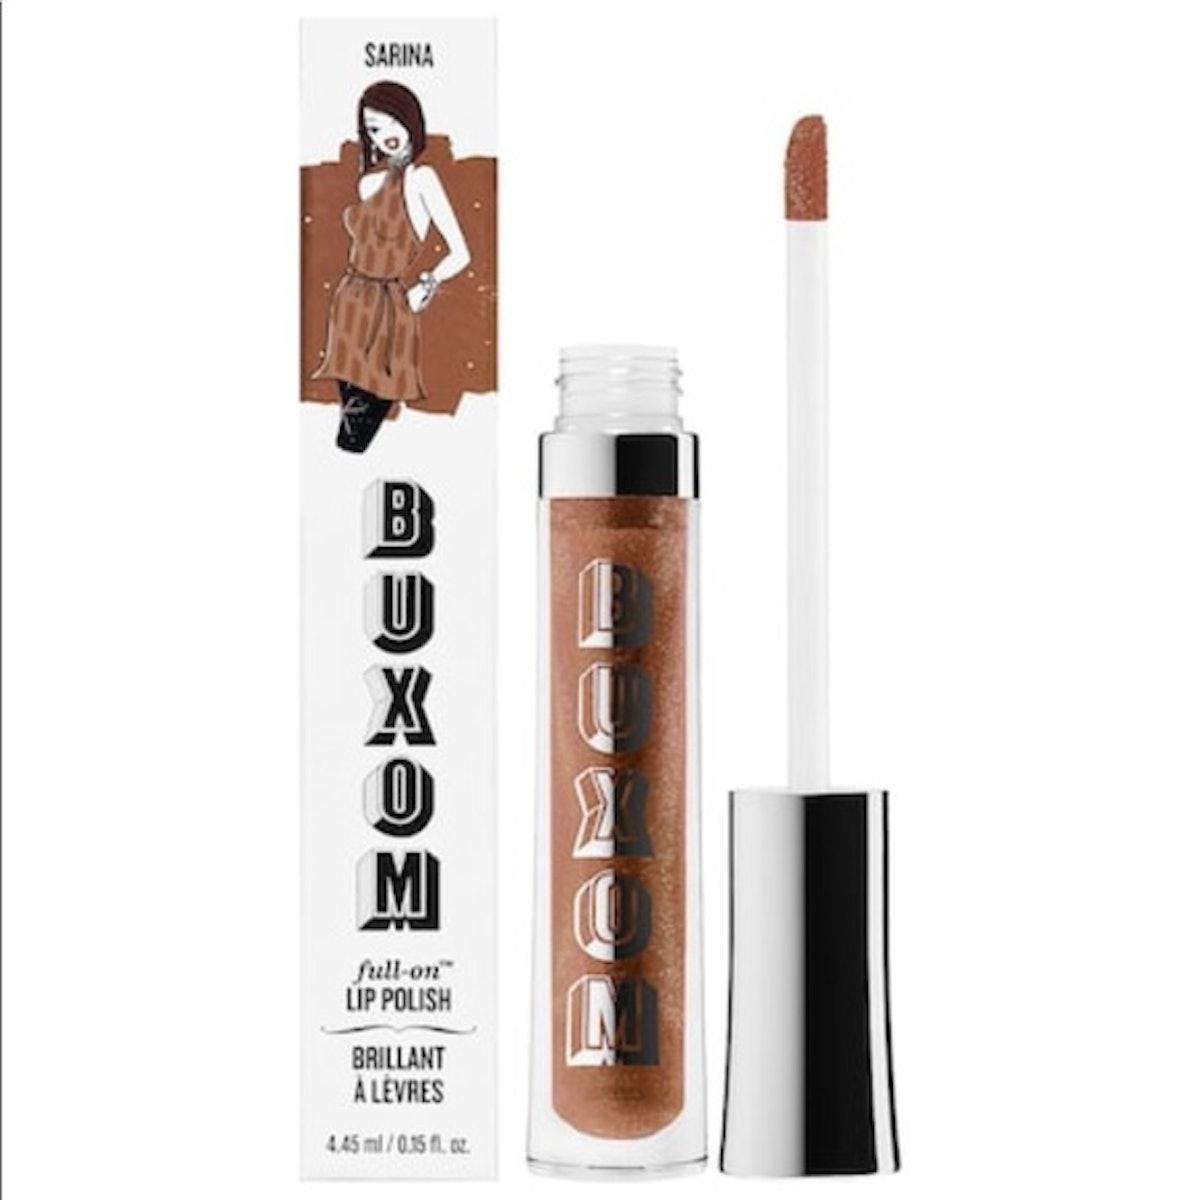 Full-On™ Plumping Lip Polish Gloss in Sarina